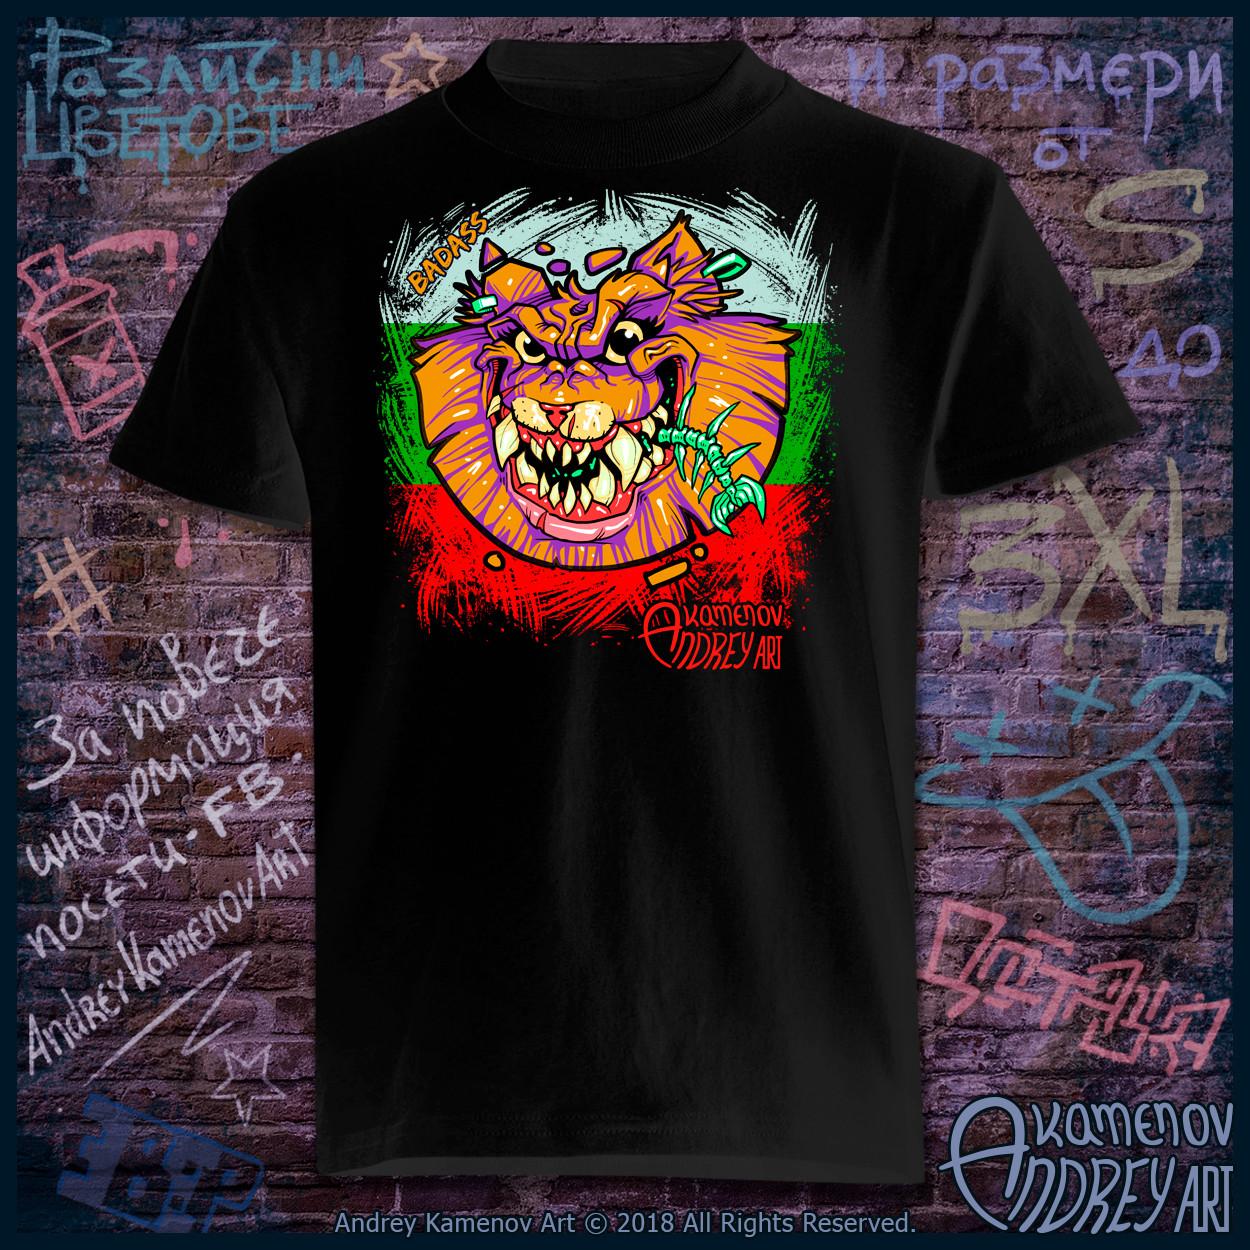 Andrey kamenov badass cat02 t shirt bg 01